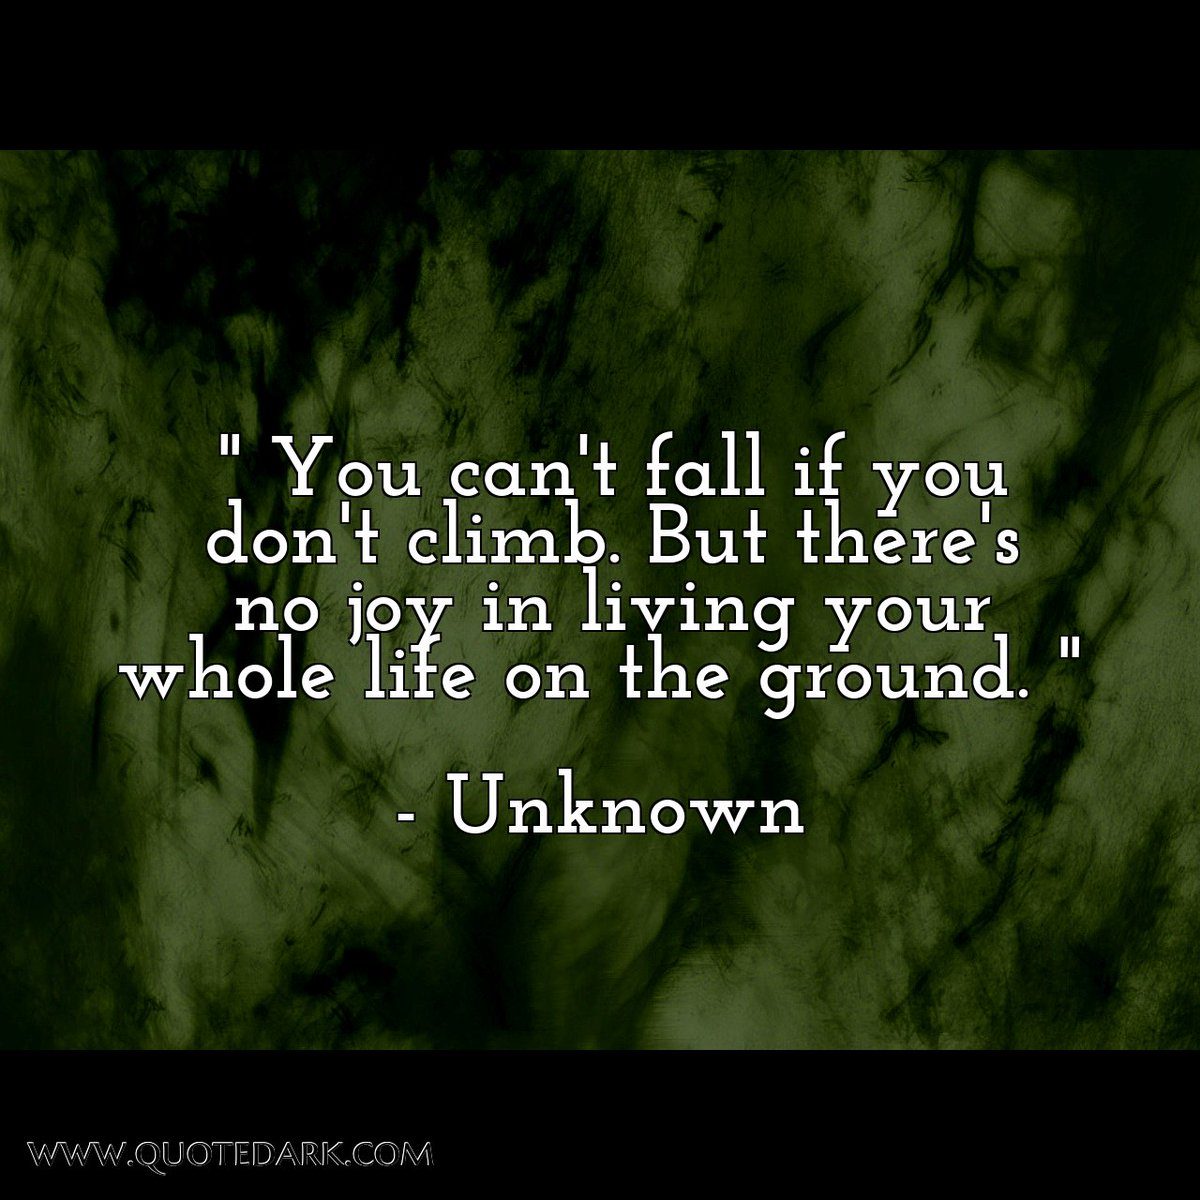 Source:  http://www. quotedark.com  &nbsp;    #quotes  #inspirationalquotes #quote #quoteoftheday #lifequotes #lovequotes #quotestoliveby #motivationalquotes #qotd #inspiration #motivation #sayings #dailyquotes #quotedark<br>http://pic.twitter.com/ruCZqwjkTb